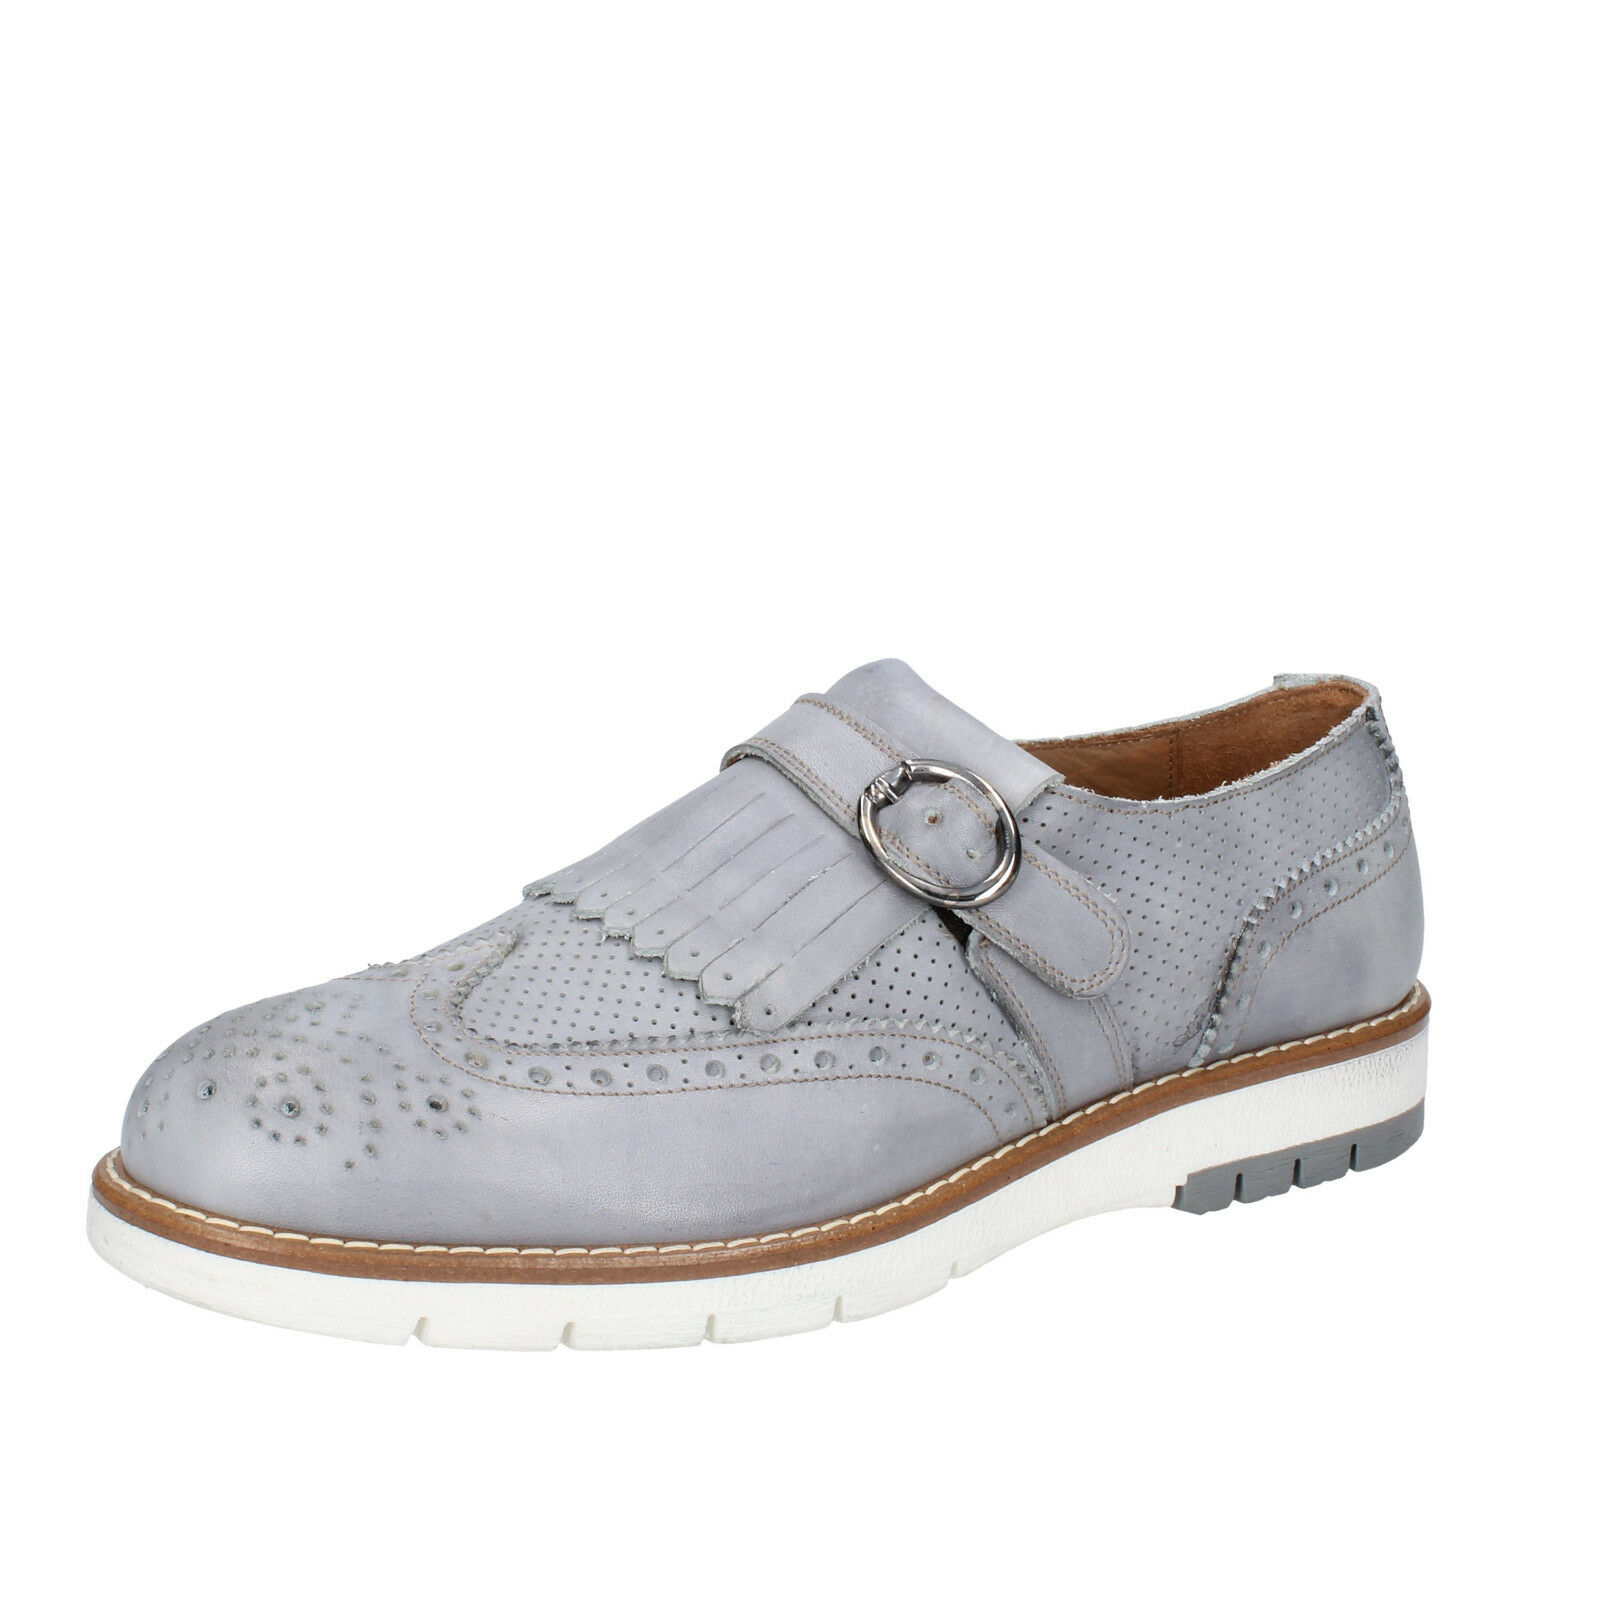 Scarpe  da uomo DI MELLA 12 (EU 45) elegante pelle grigia BZ31 -F  vendita outlet